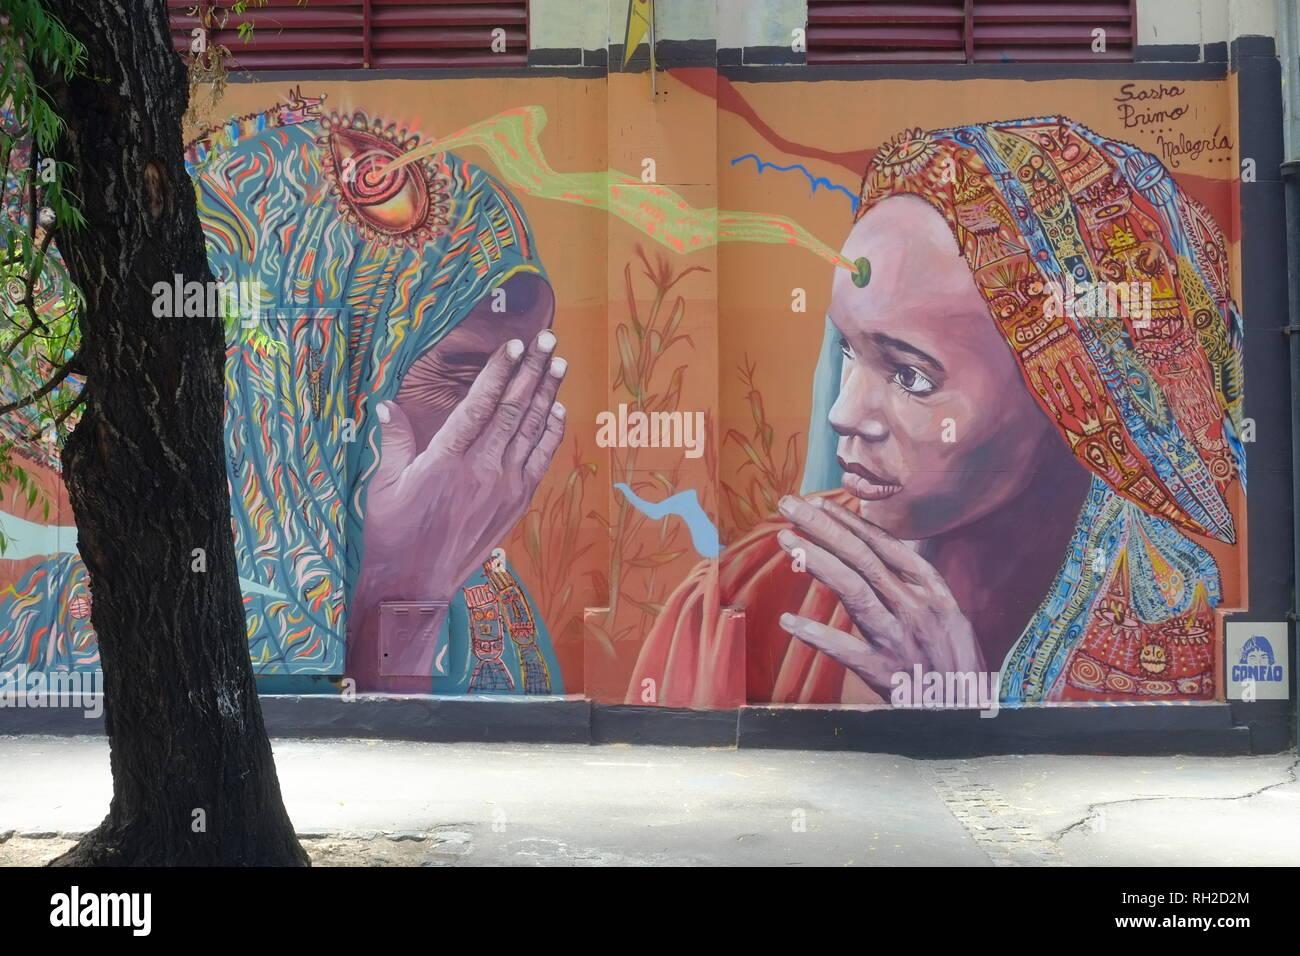 Street Art, Buenos Aires - empatia Immagini Stock